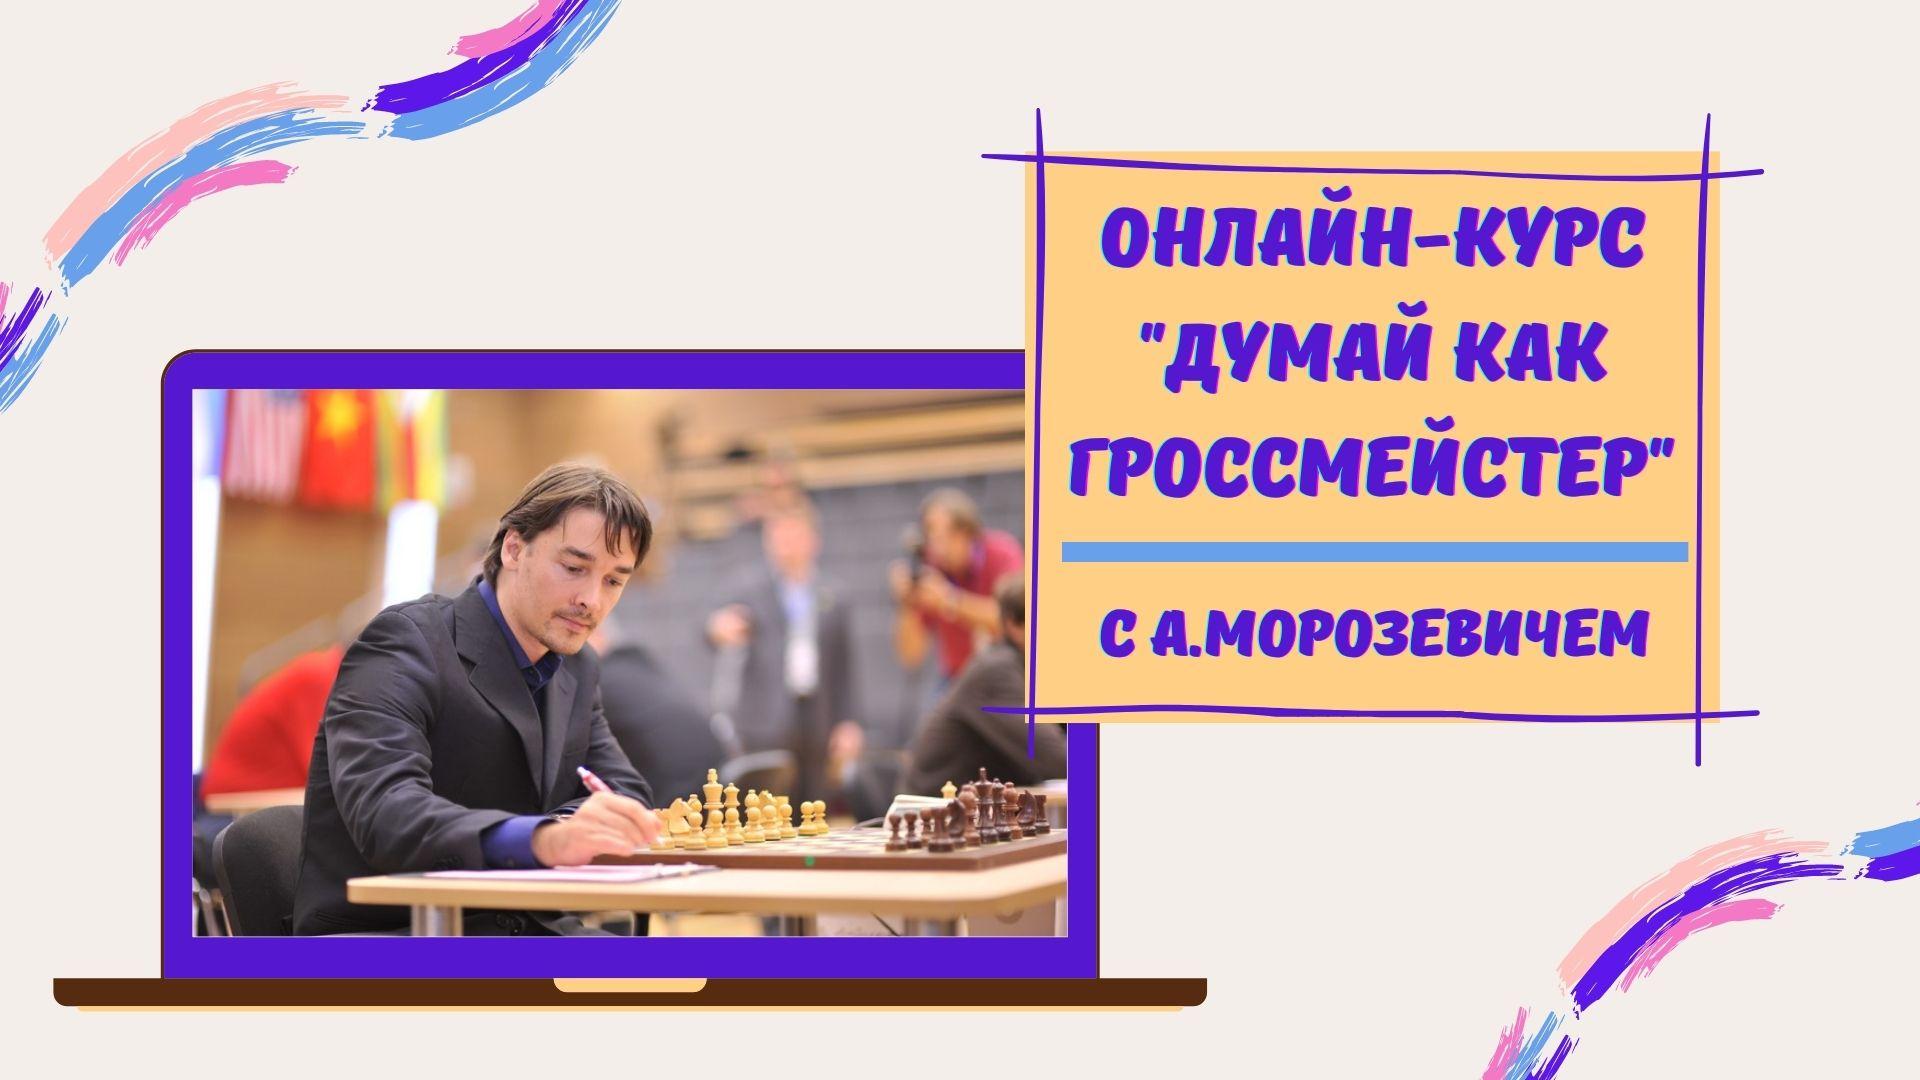 Онлайн-курс Думай как гроссмейстер